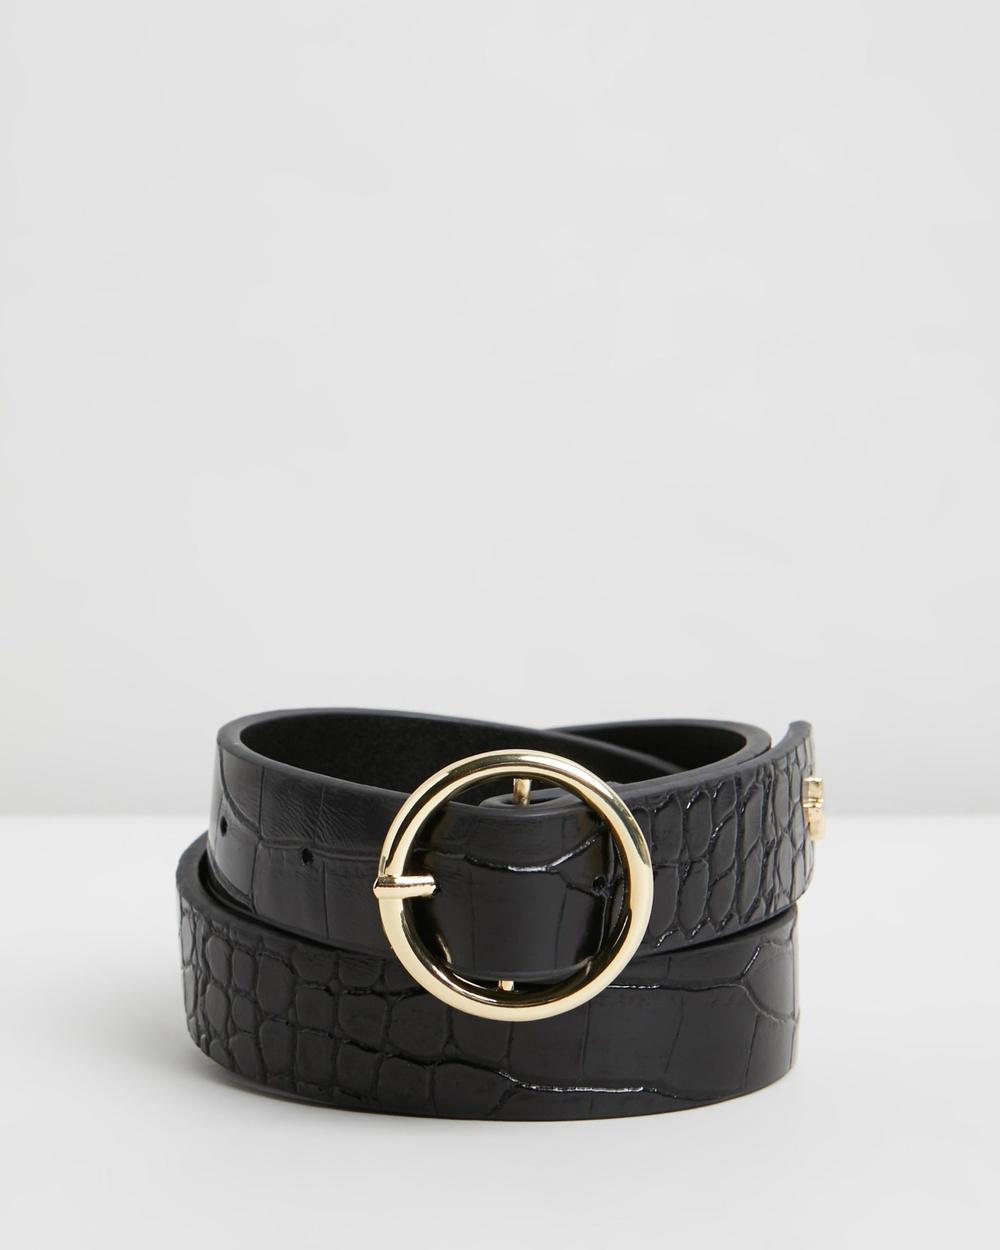 PETA AND JAIN Dayton Buckle Belt Belts Black Croc